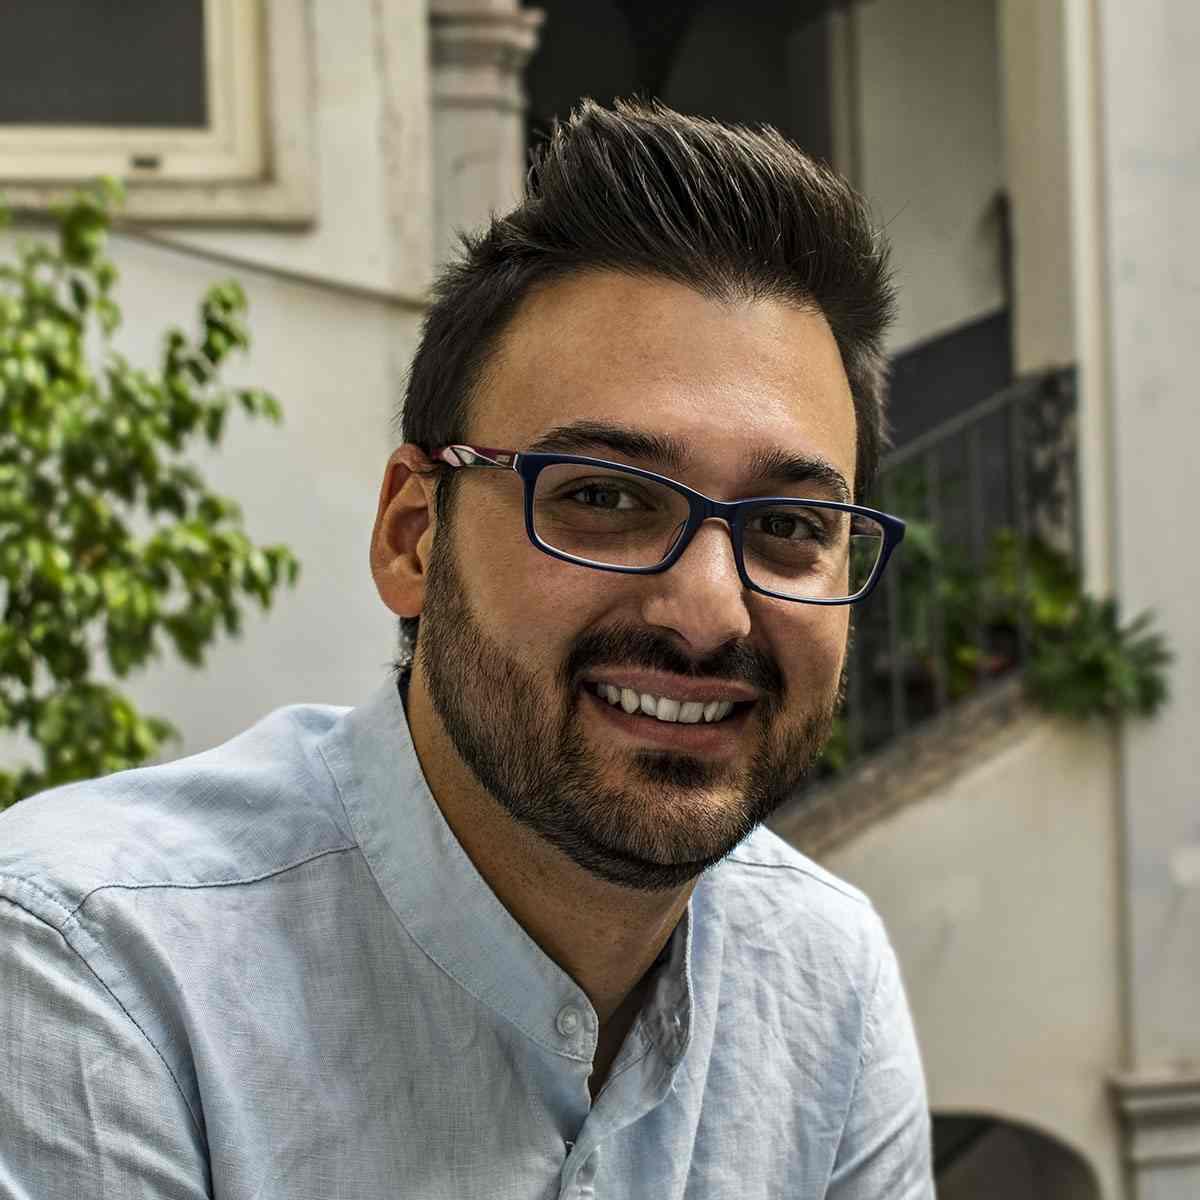 Ciro Lieto Digital Marketer